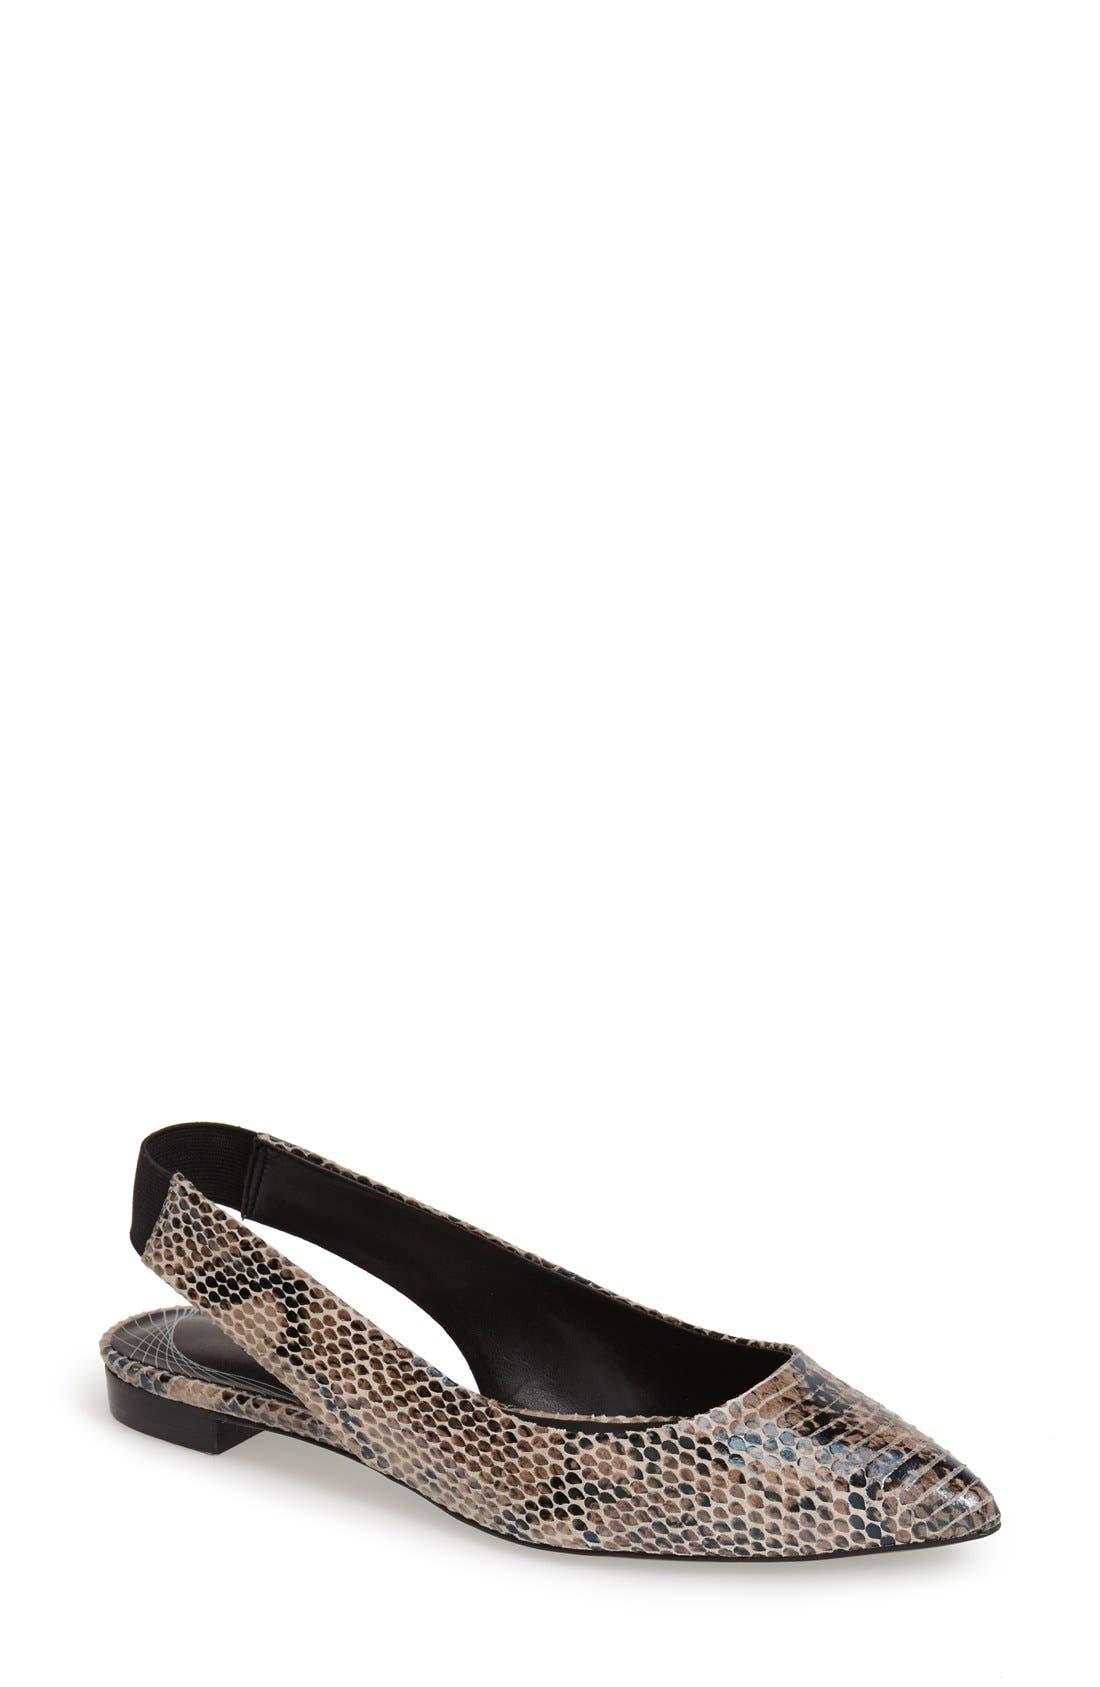 Alternate Image 1 Selected - Trouvé 'Mona' Pointy Toe Leather Flat (Women)